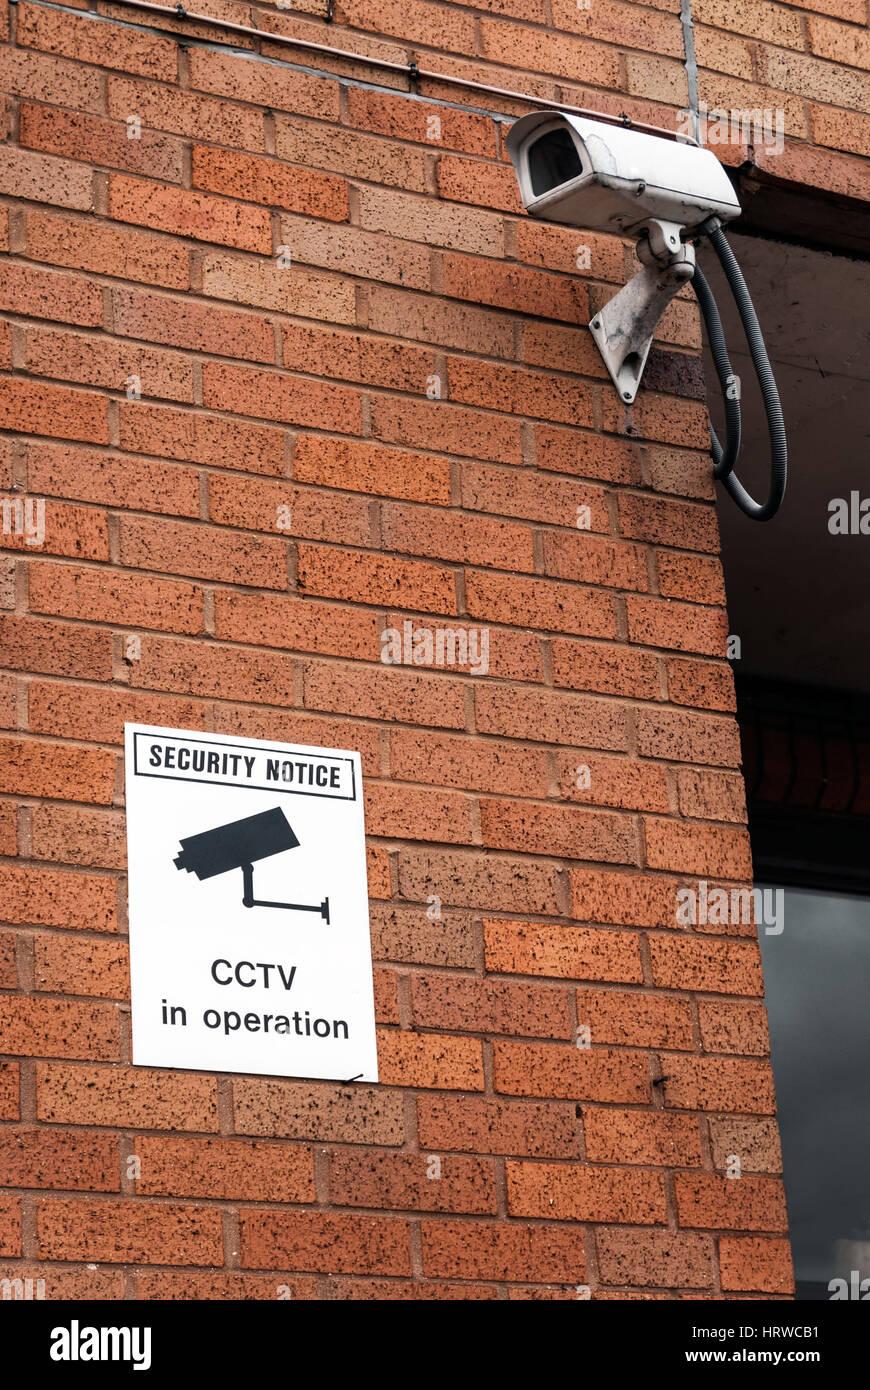 CCTV camera and warning notice on urban red brick wall - Stock Image